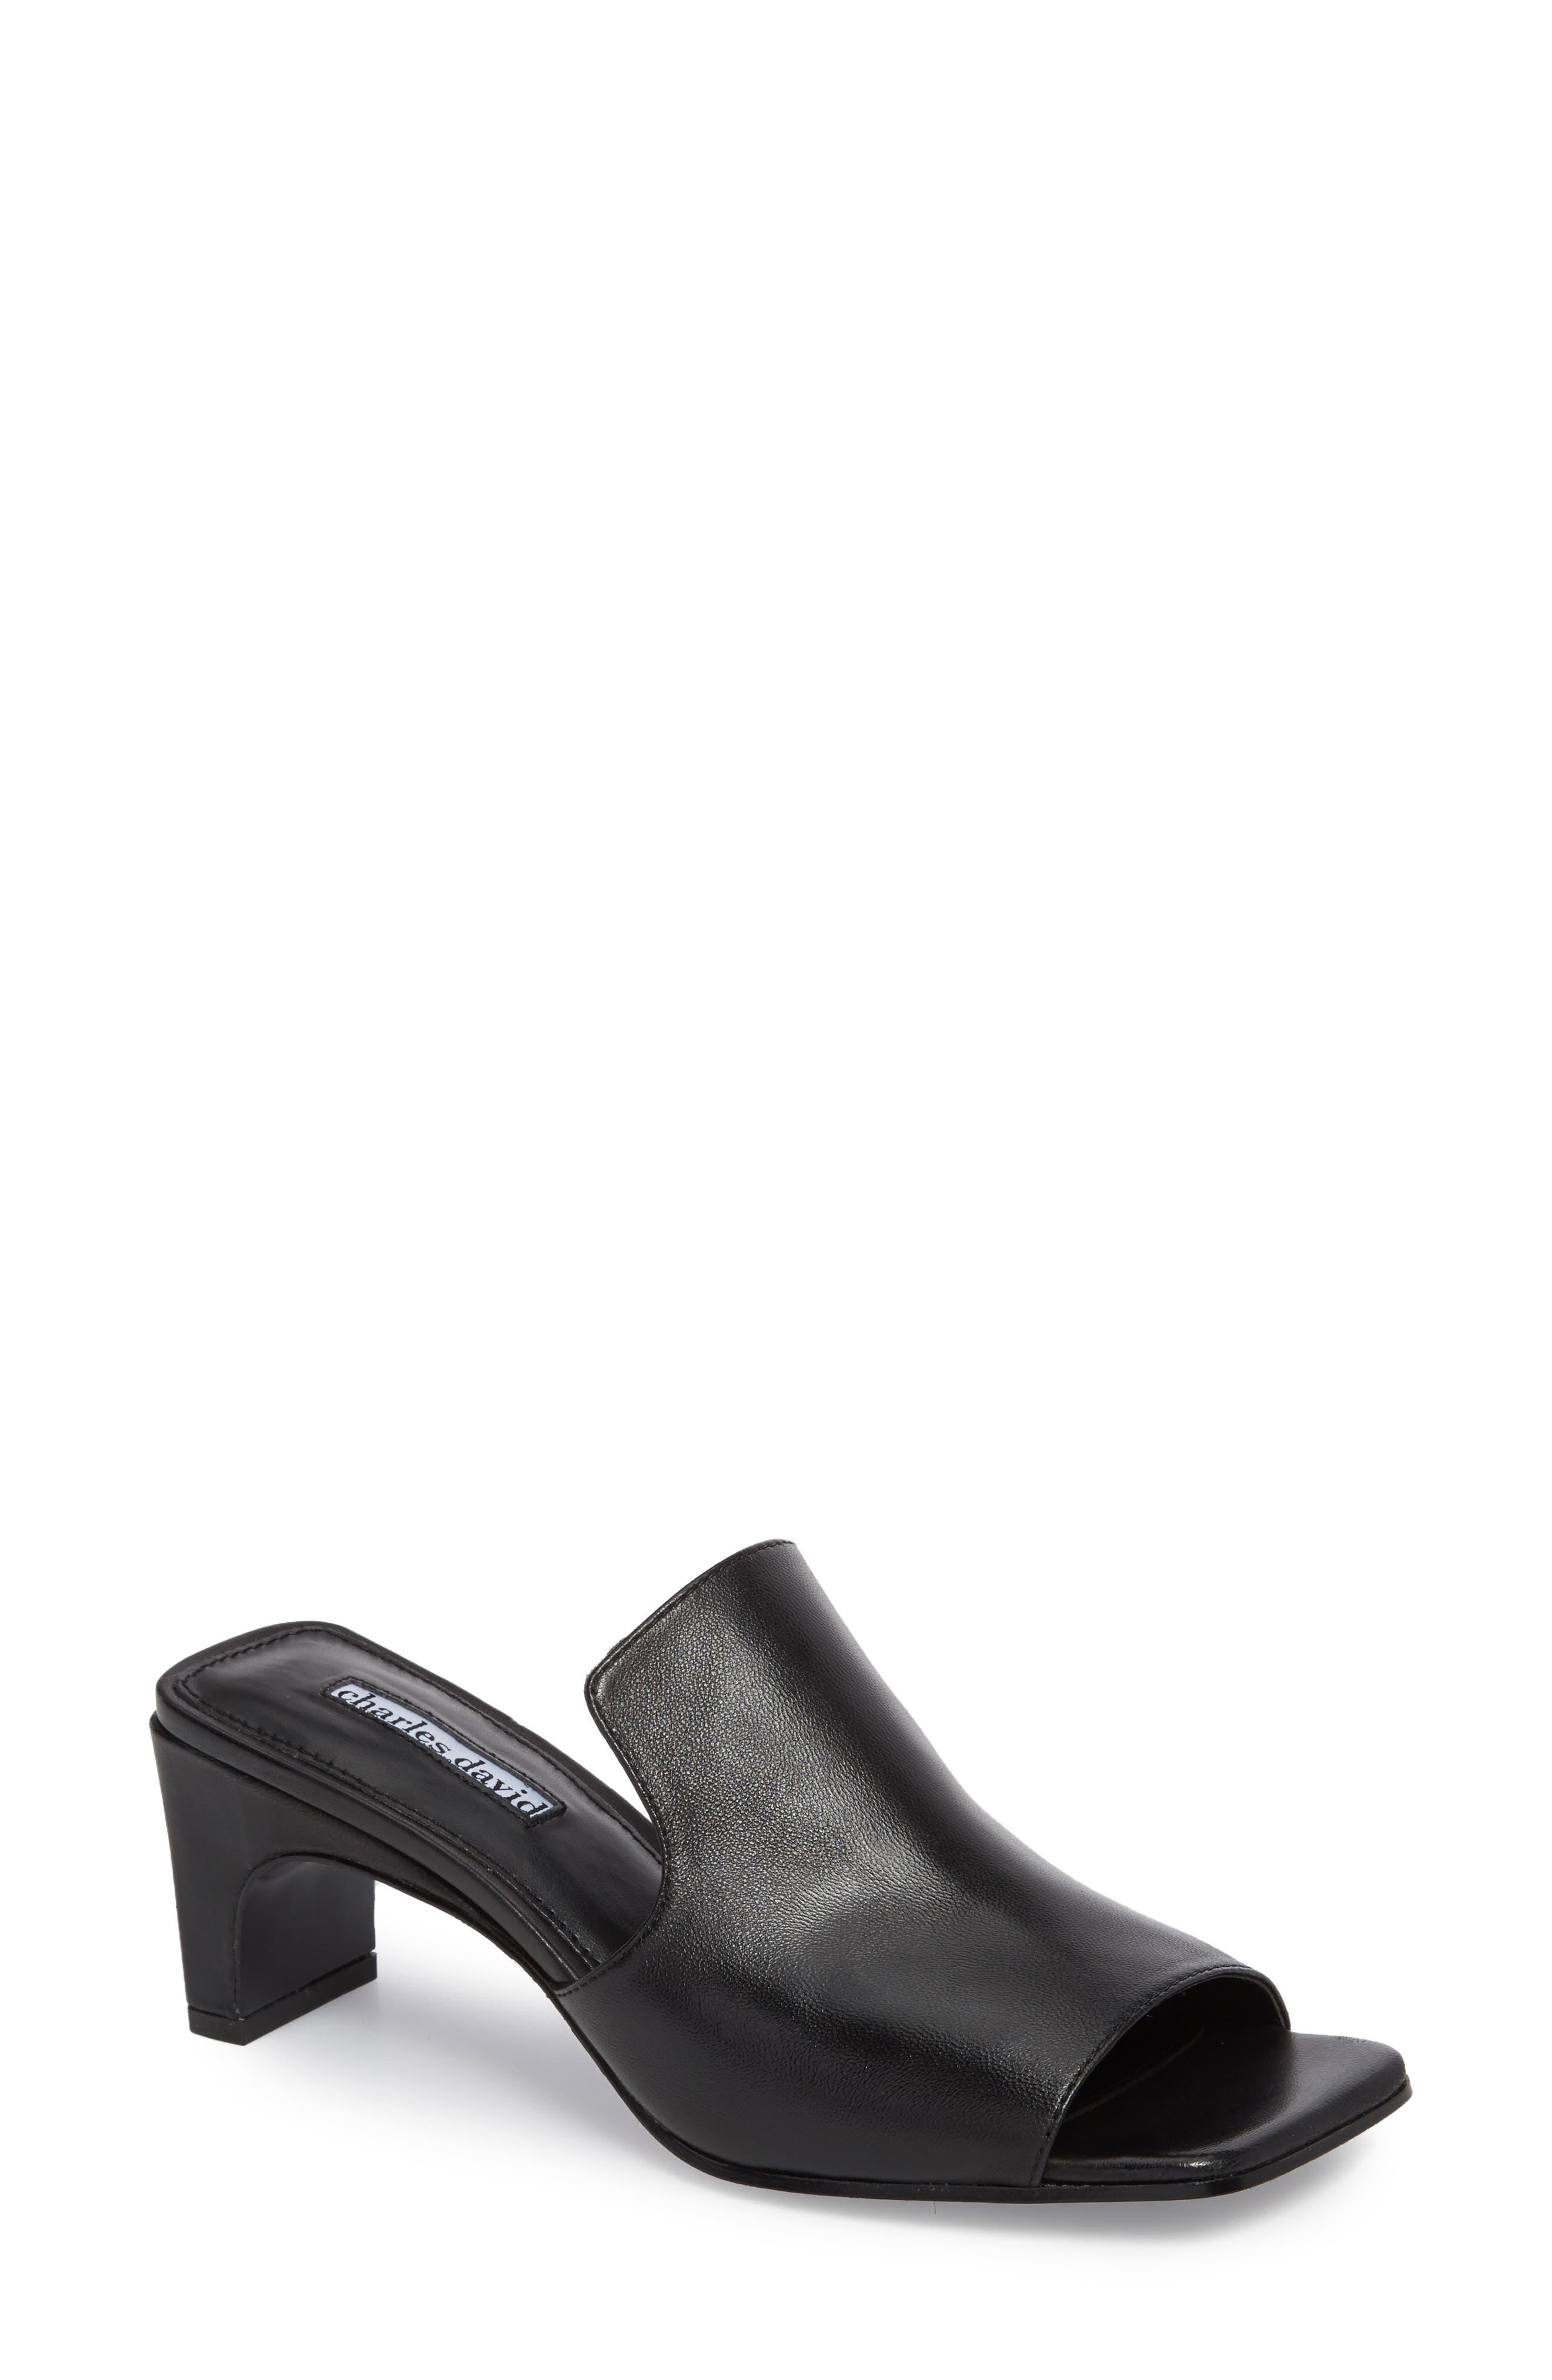 Charles David Herald Slide Sandal- Black